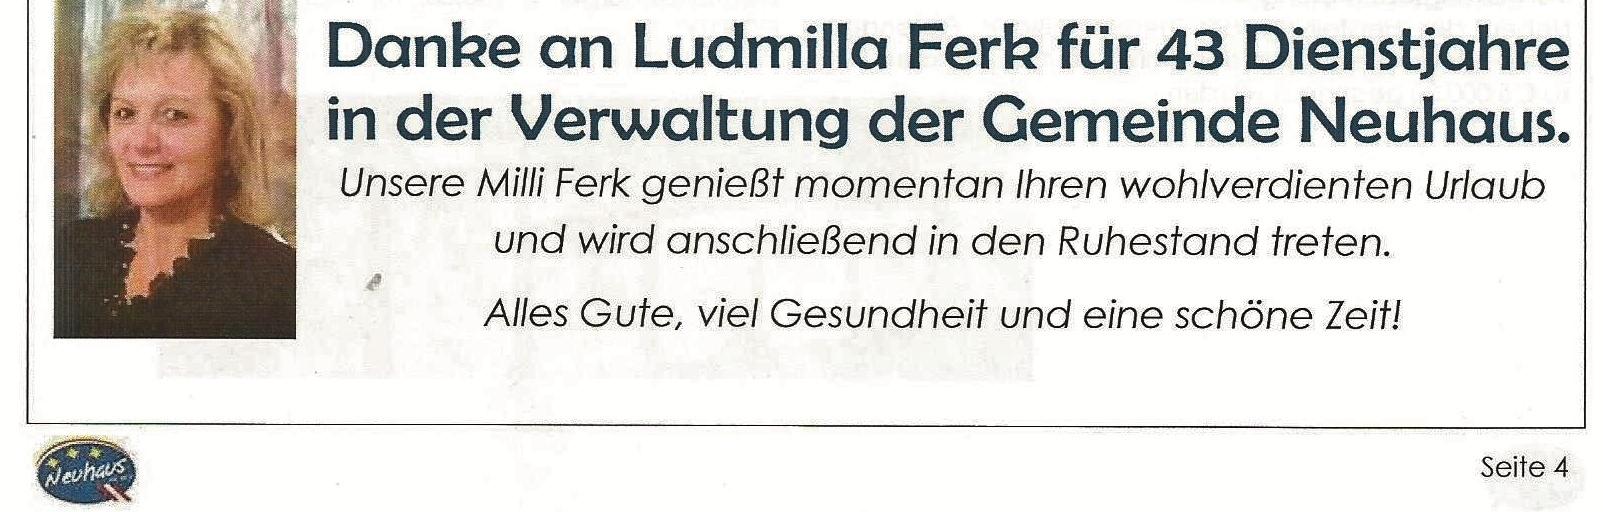 Ludmilla Ferk (1603x512)